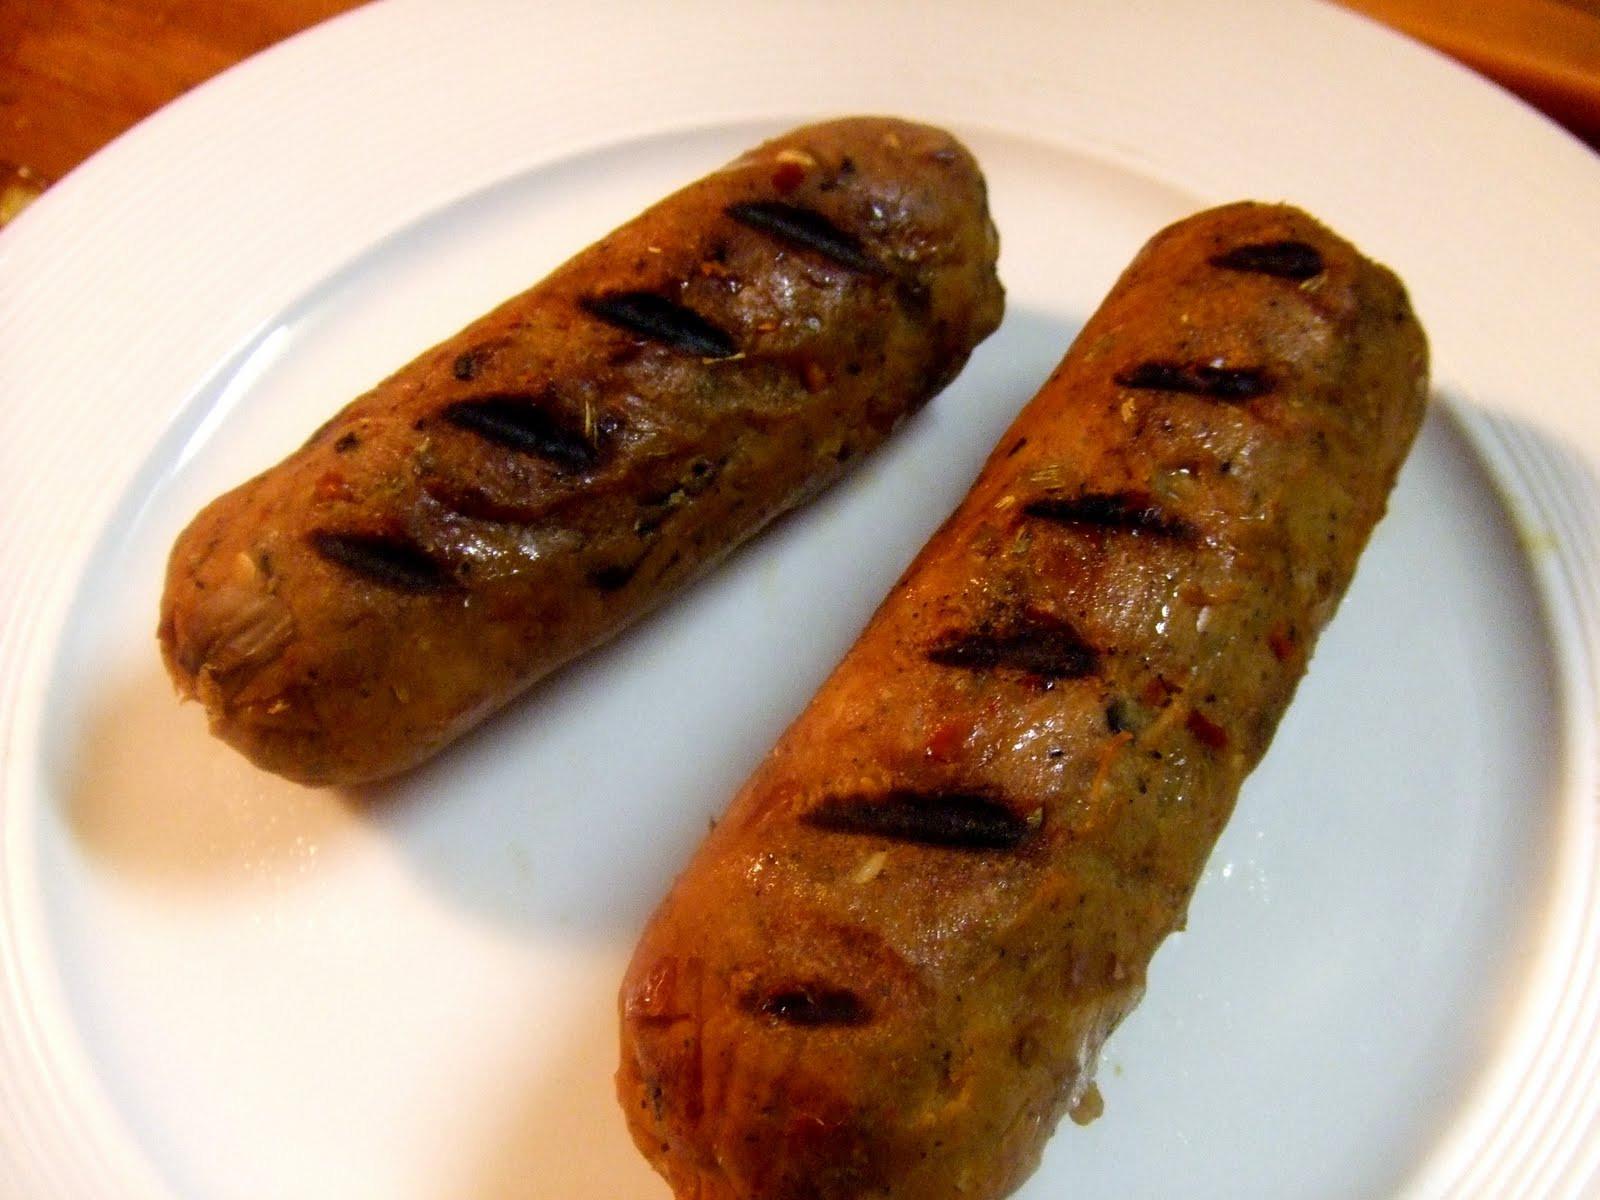 Vegan Italian Sausage Recipes  Spicy Italian Sausage Vegan Soy Free and Gluten Free